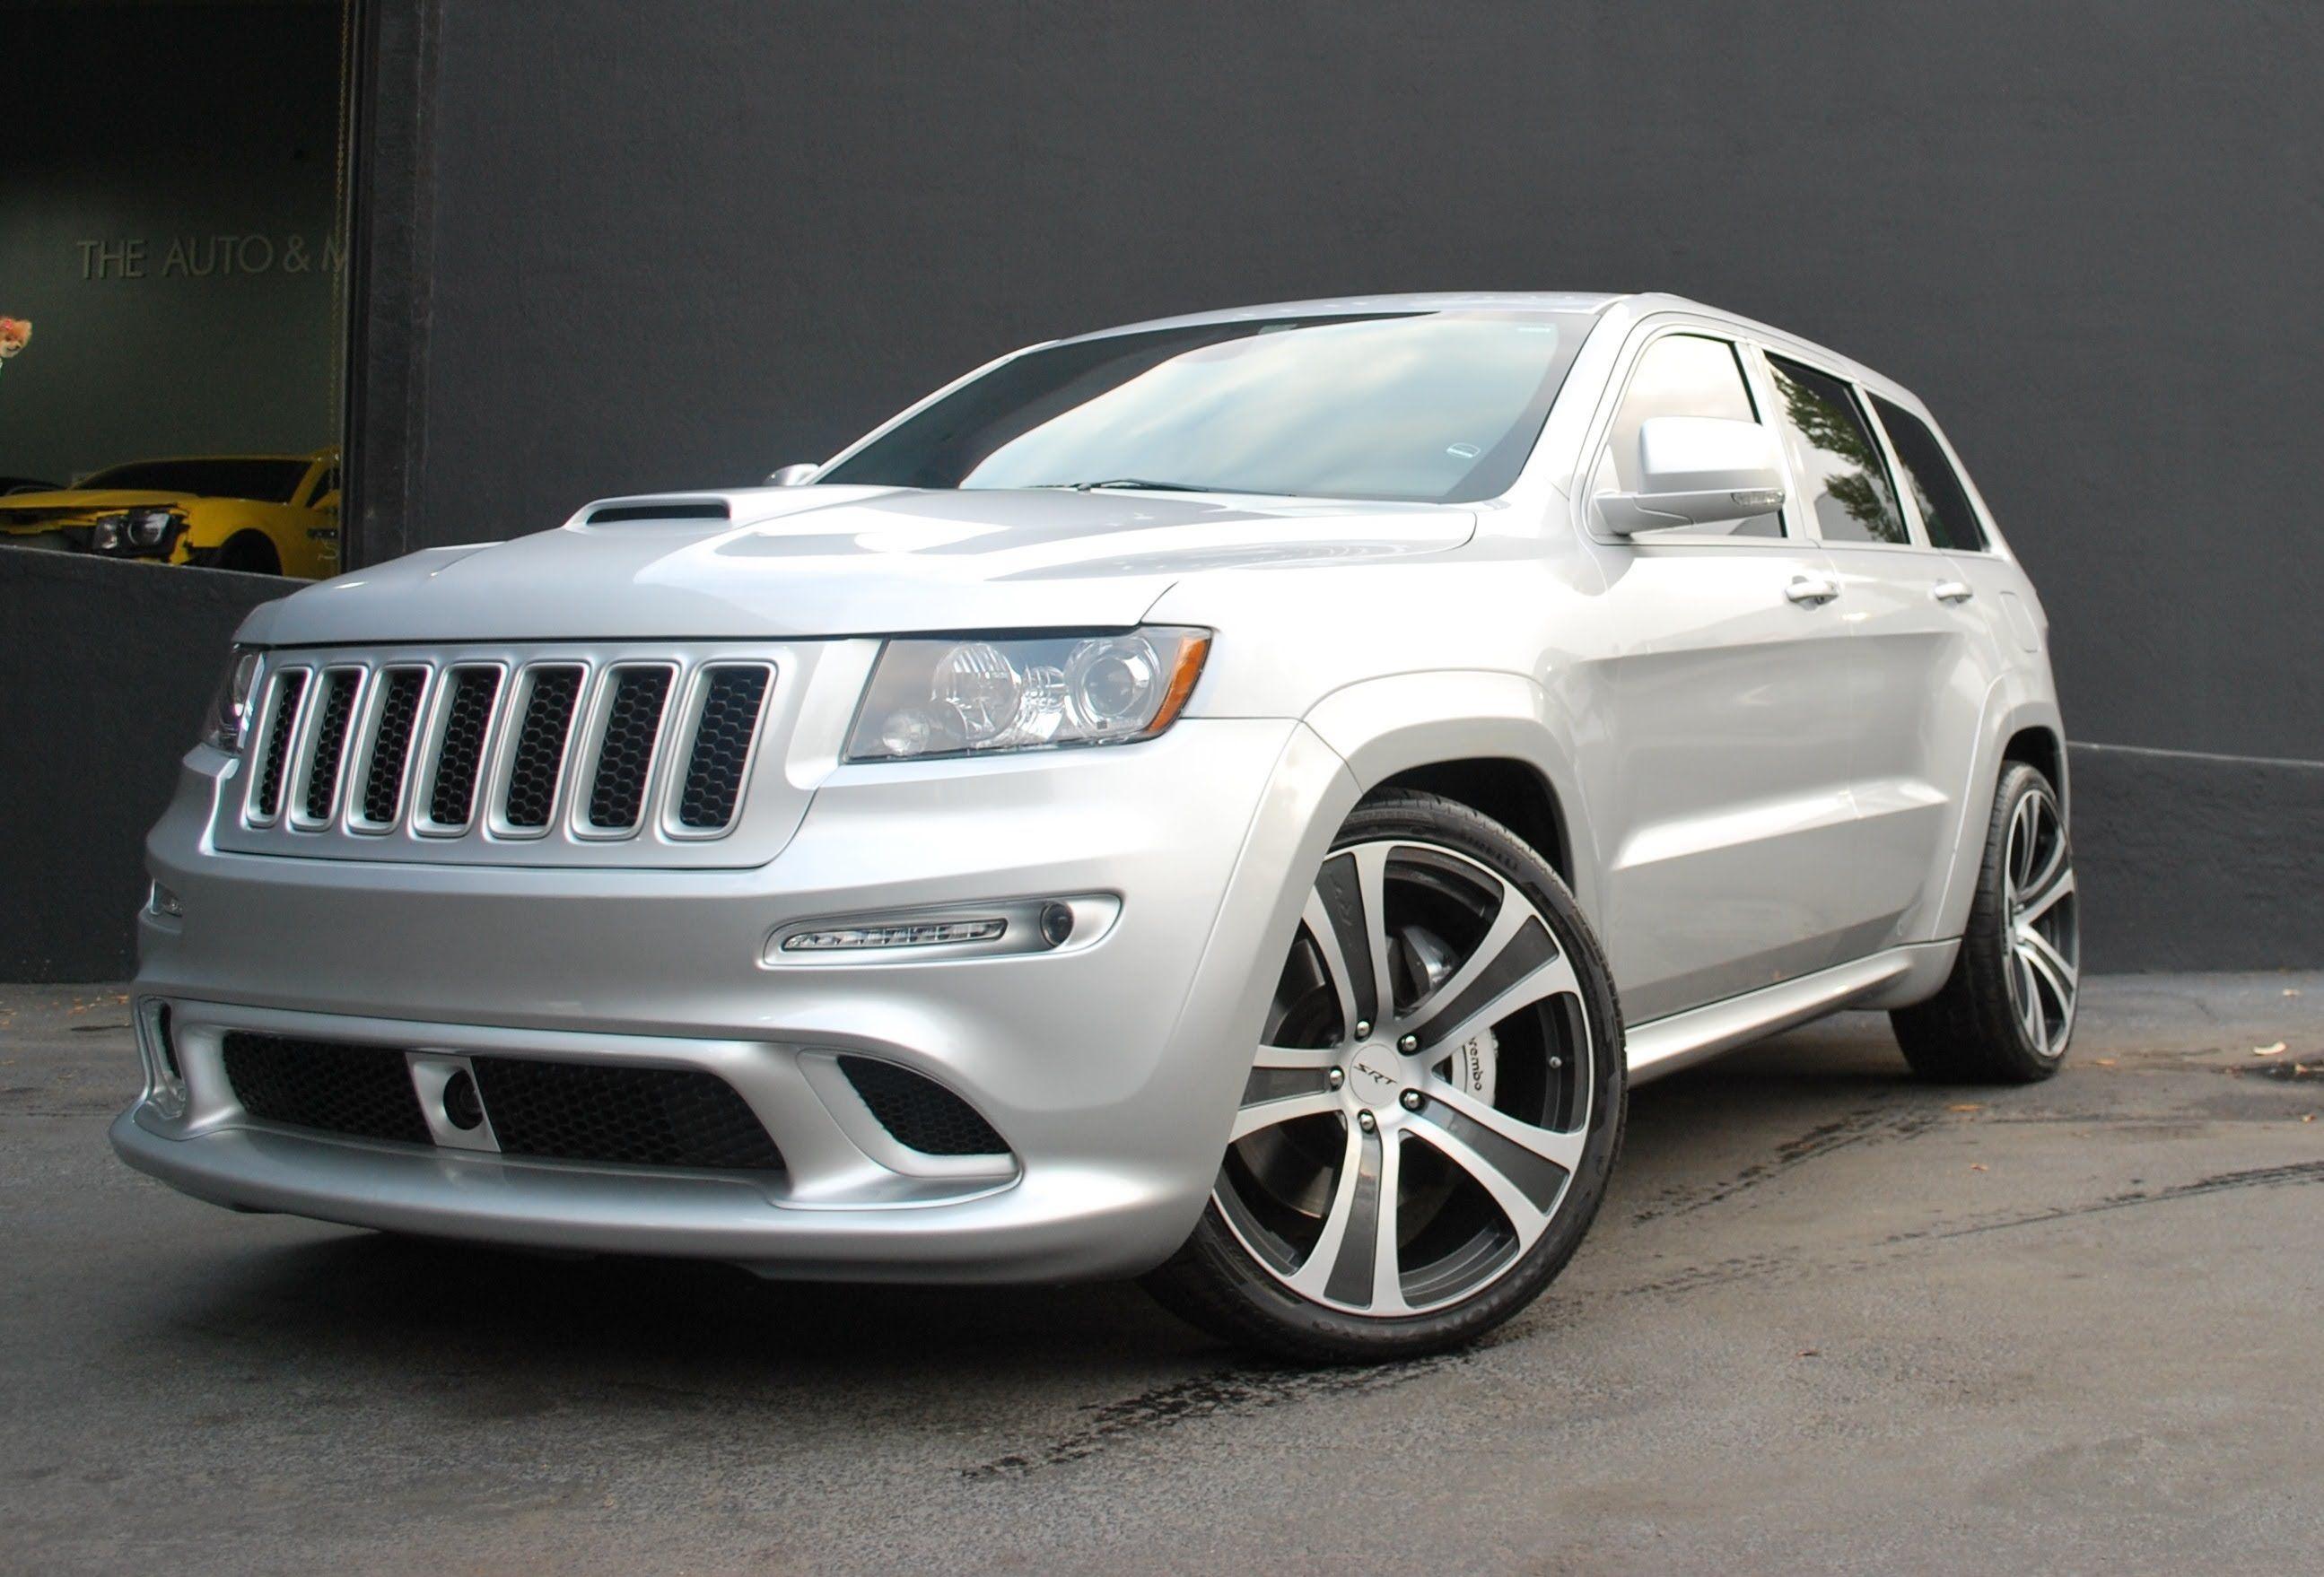 Jeep 4x4 wheels google search diego wants new rims pinterest 4x4 wheels jeep 4x4 and jeeps